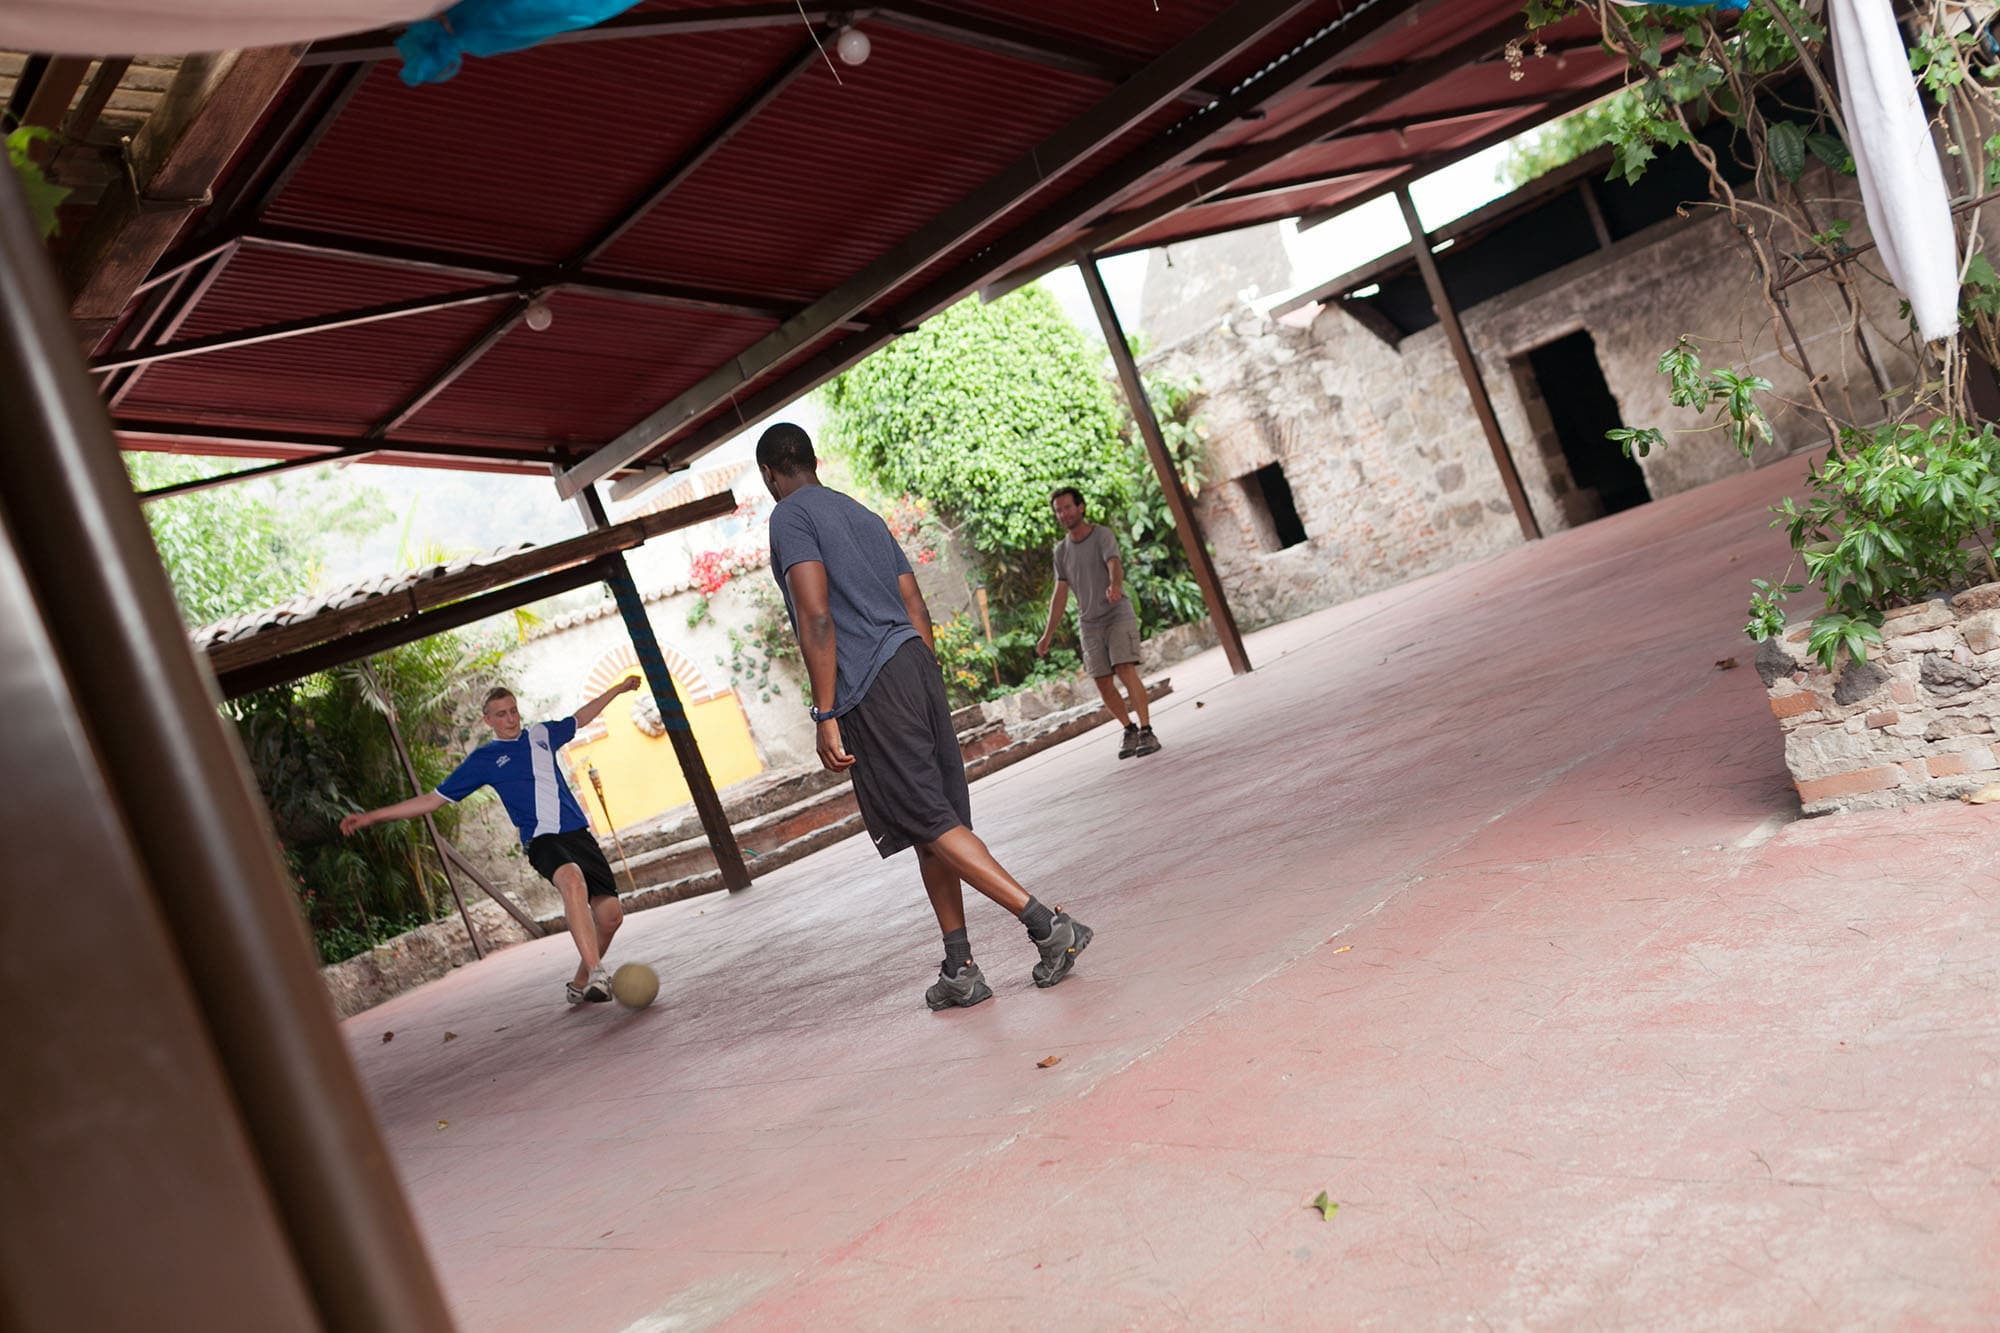 Playing soccer in Antigua, Guatemala